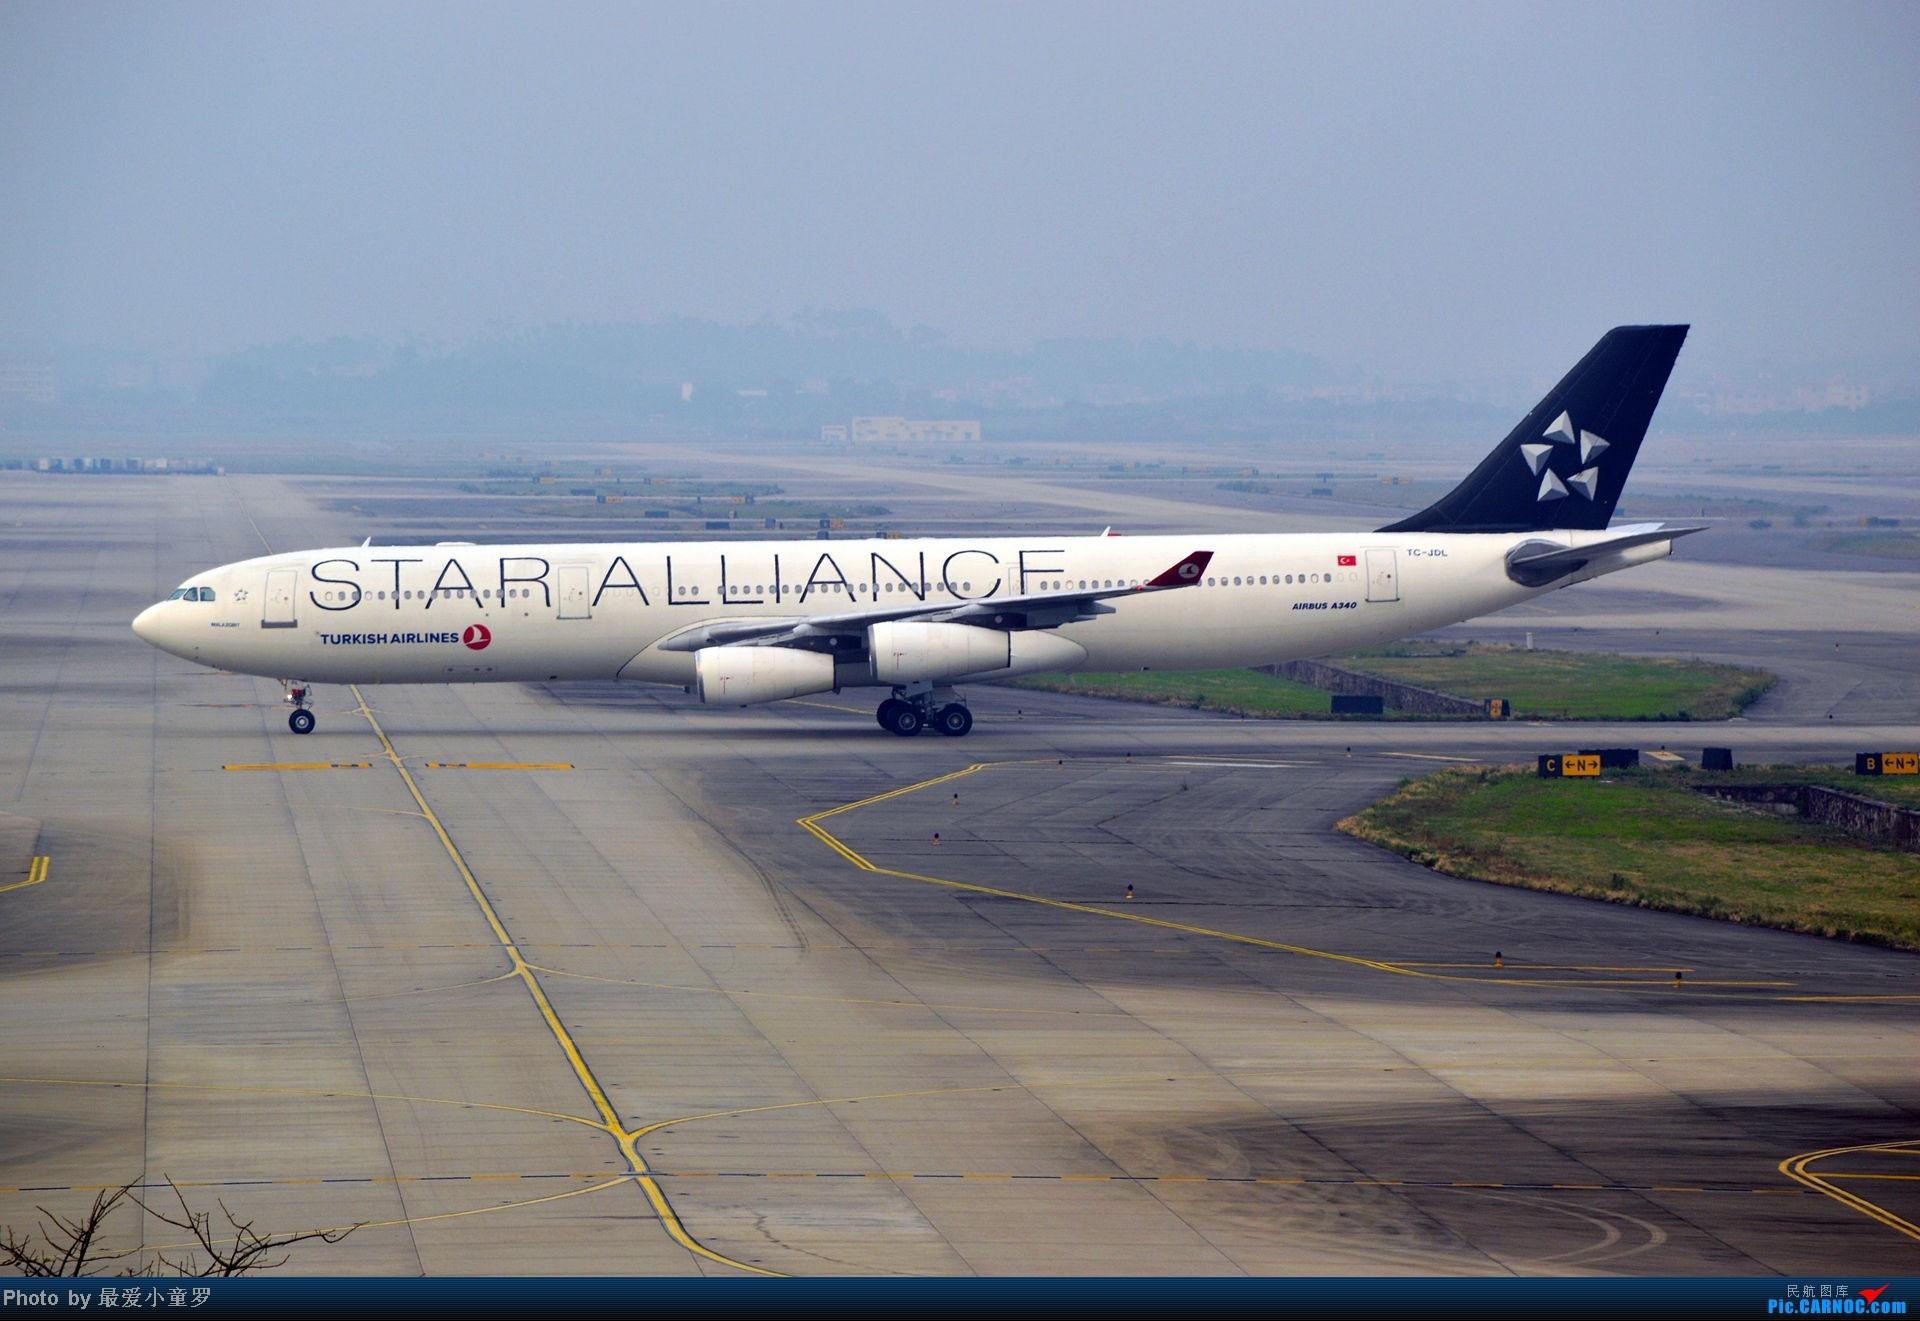 Re:[原创]去年11月15日,CAN烂天拍机,修出来的图无法直视 AIRBUS A340-300 TC-JDL